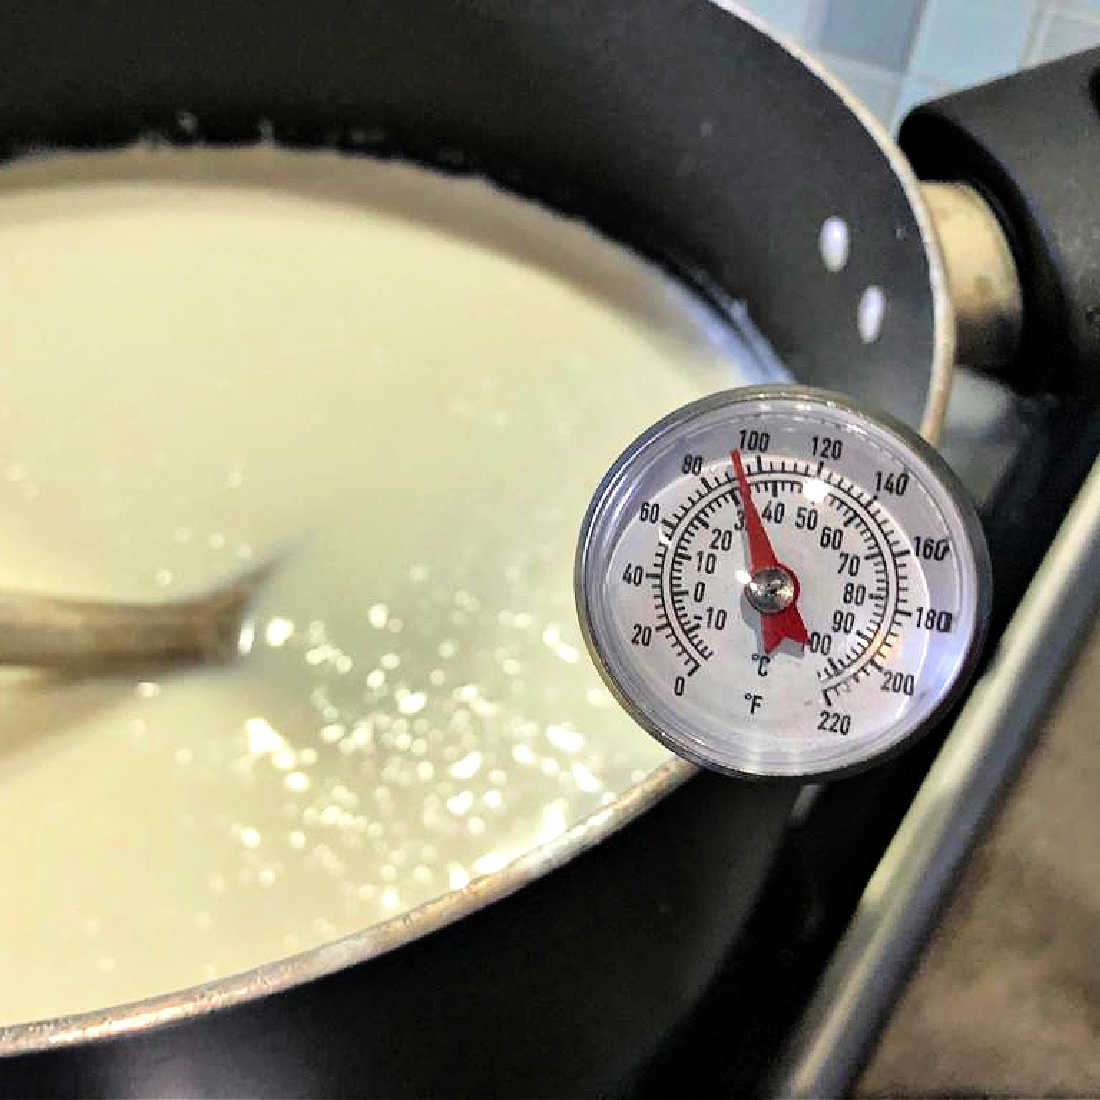 Cheesemaking-Jen-Heating-to-38-degrees-low-resAlStW1CbitlZb